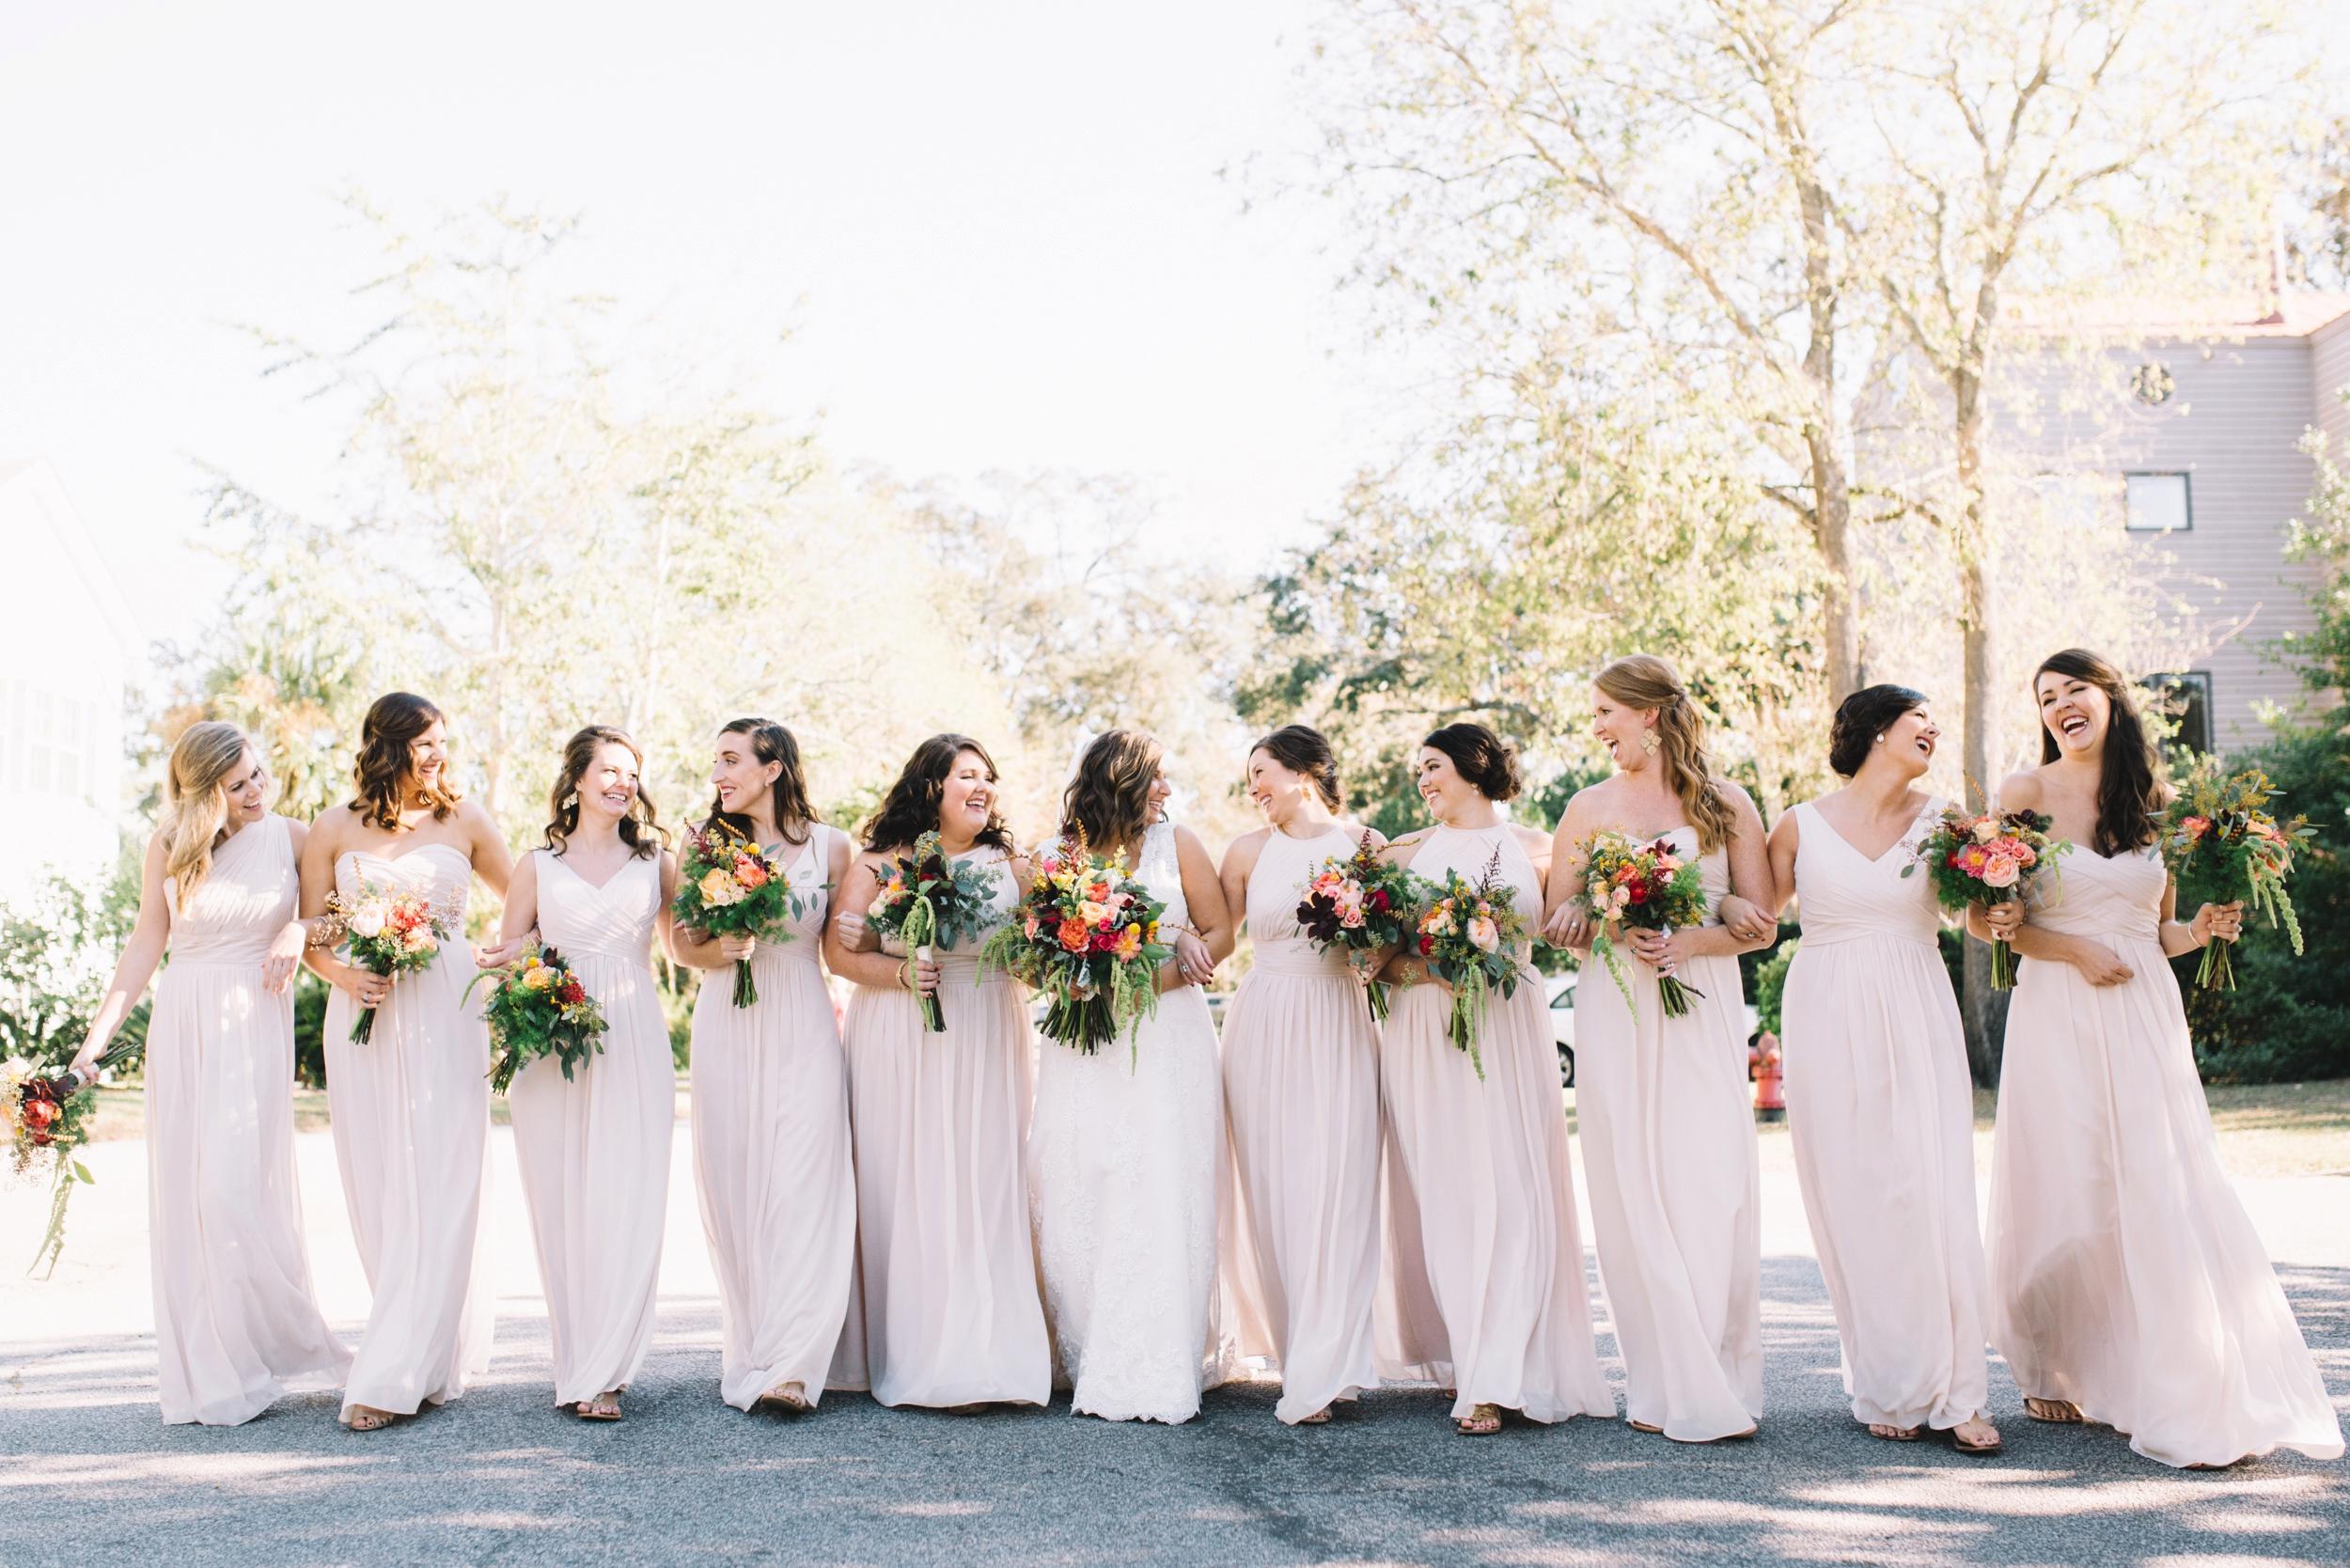 Charleston-wedding-photographer-27.jpg